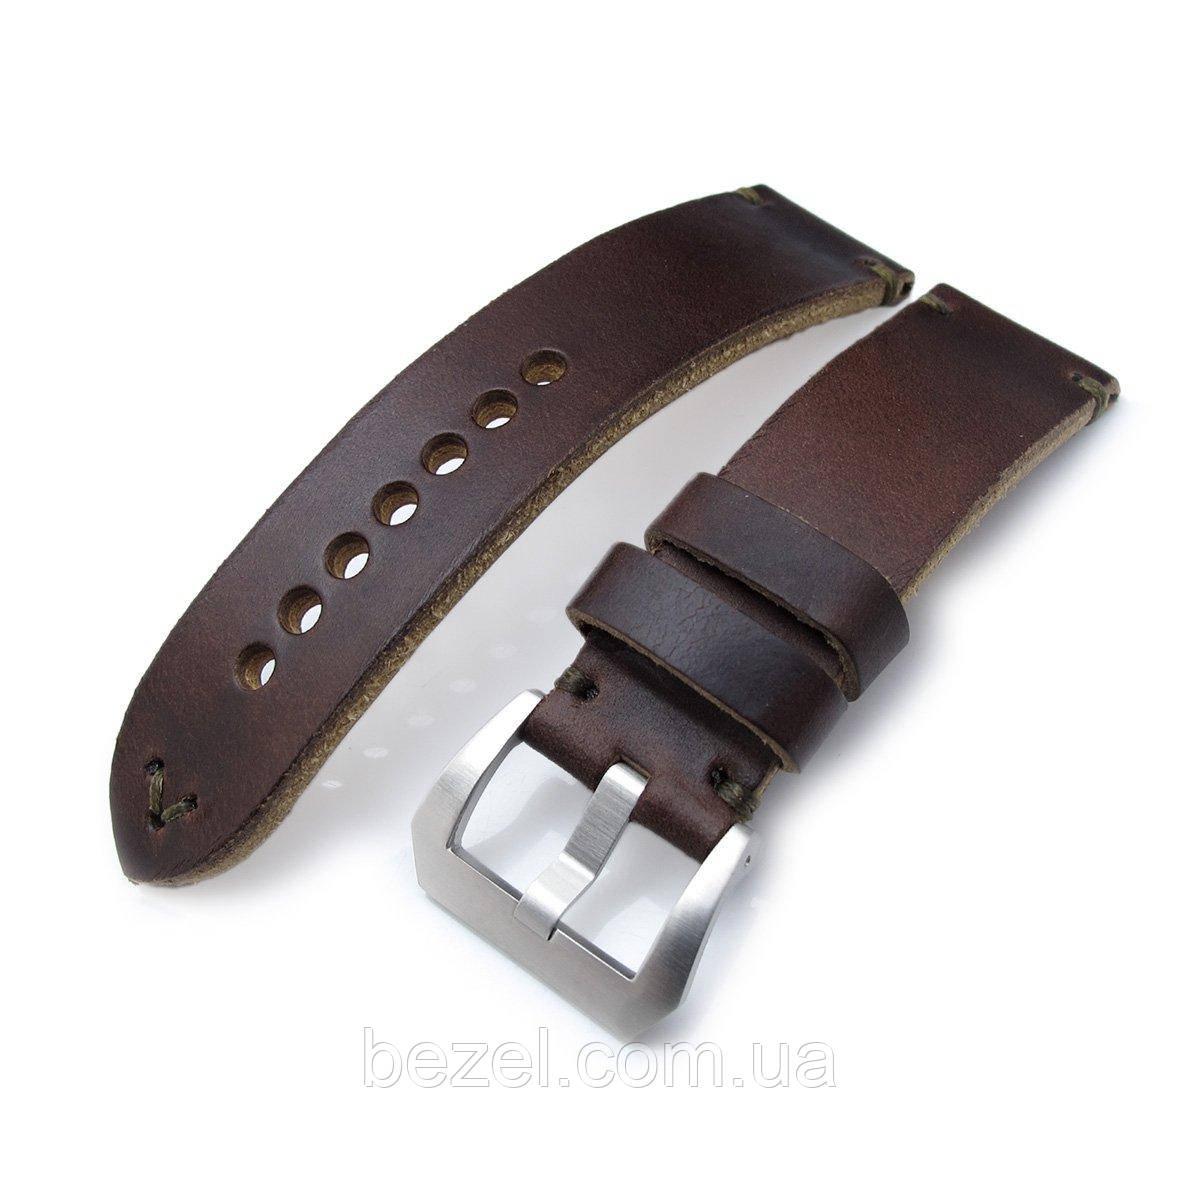 24mm MiLTAT Horween Chromexcel Watch Strap, Matte Brown, Military Green Stitching